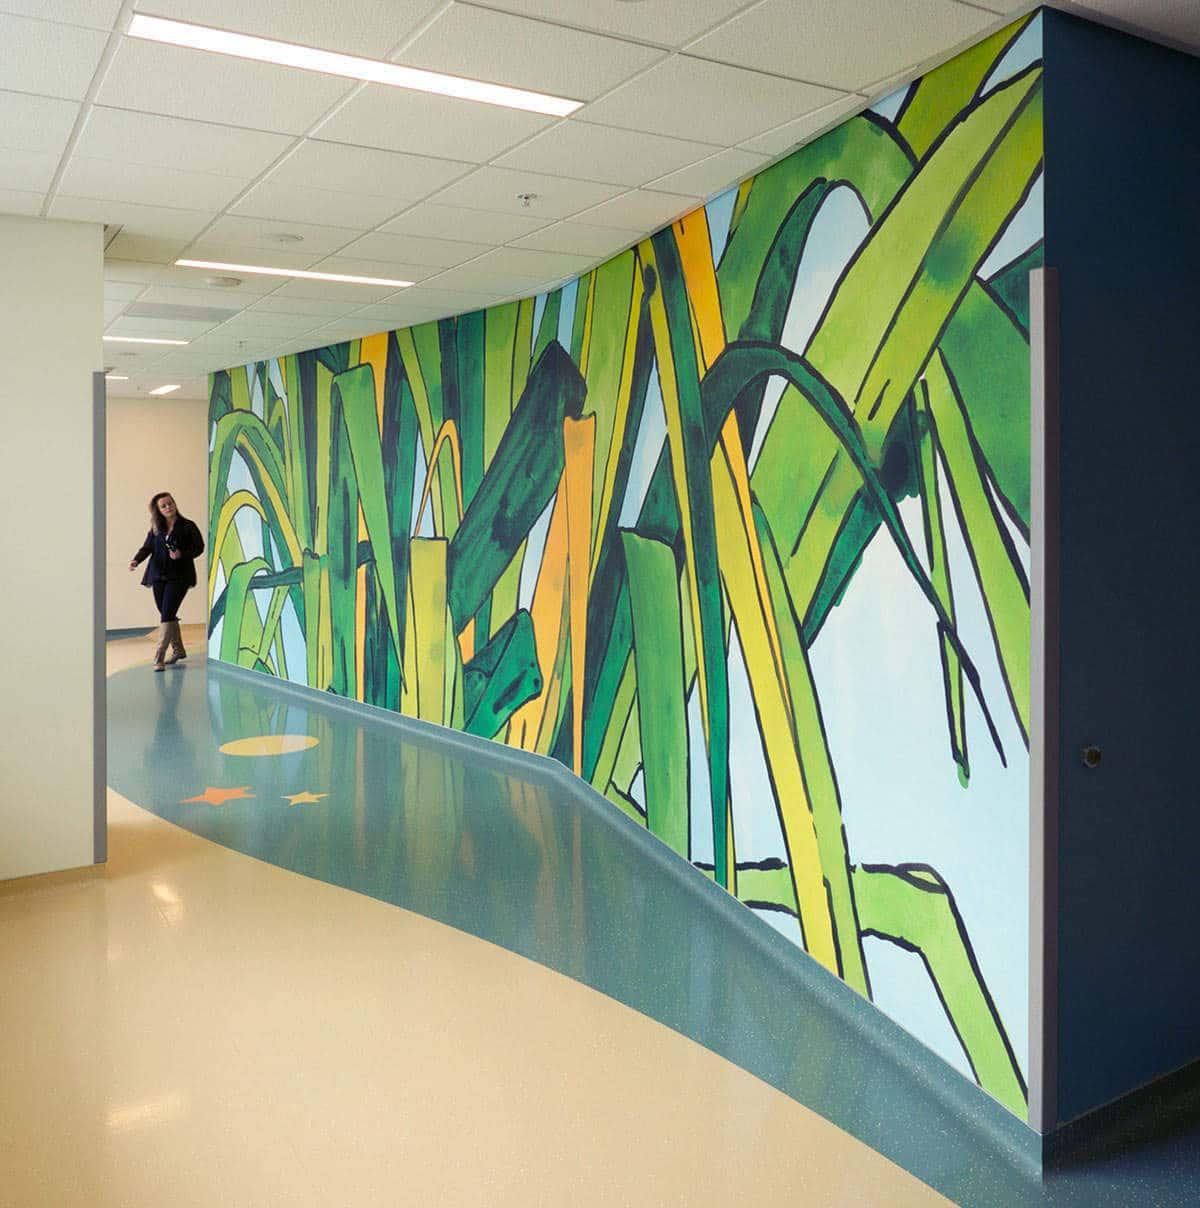 UCSF Dave Muller Big Leaves Hallway Mural and Sara